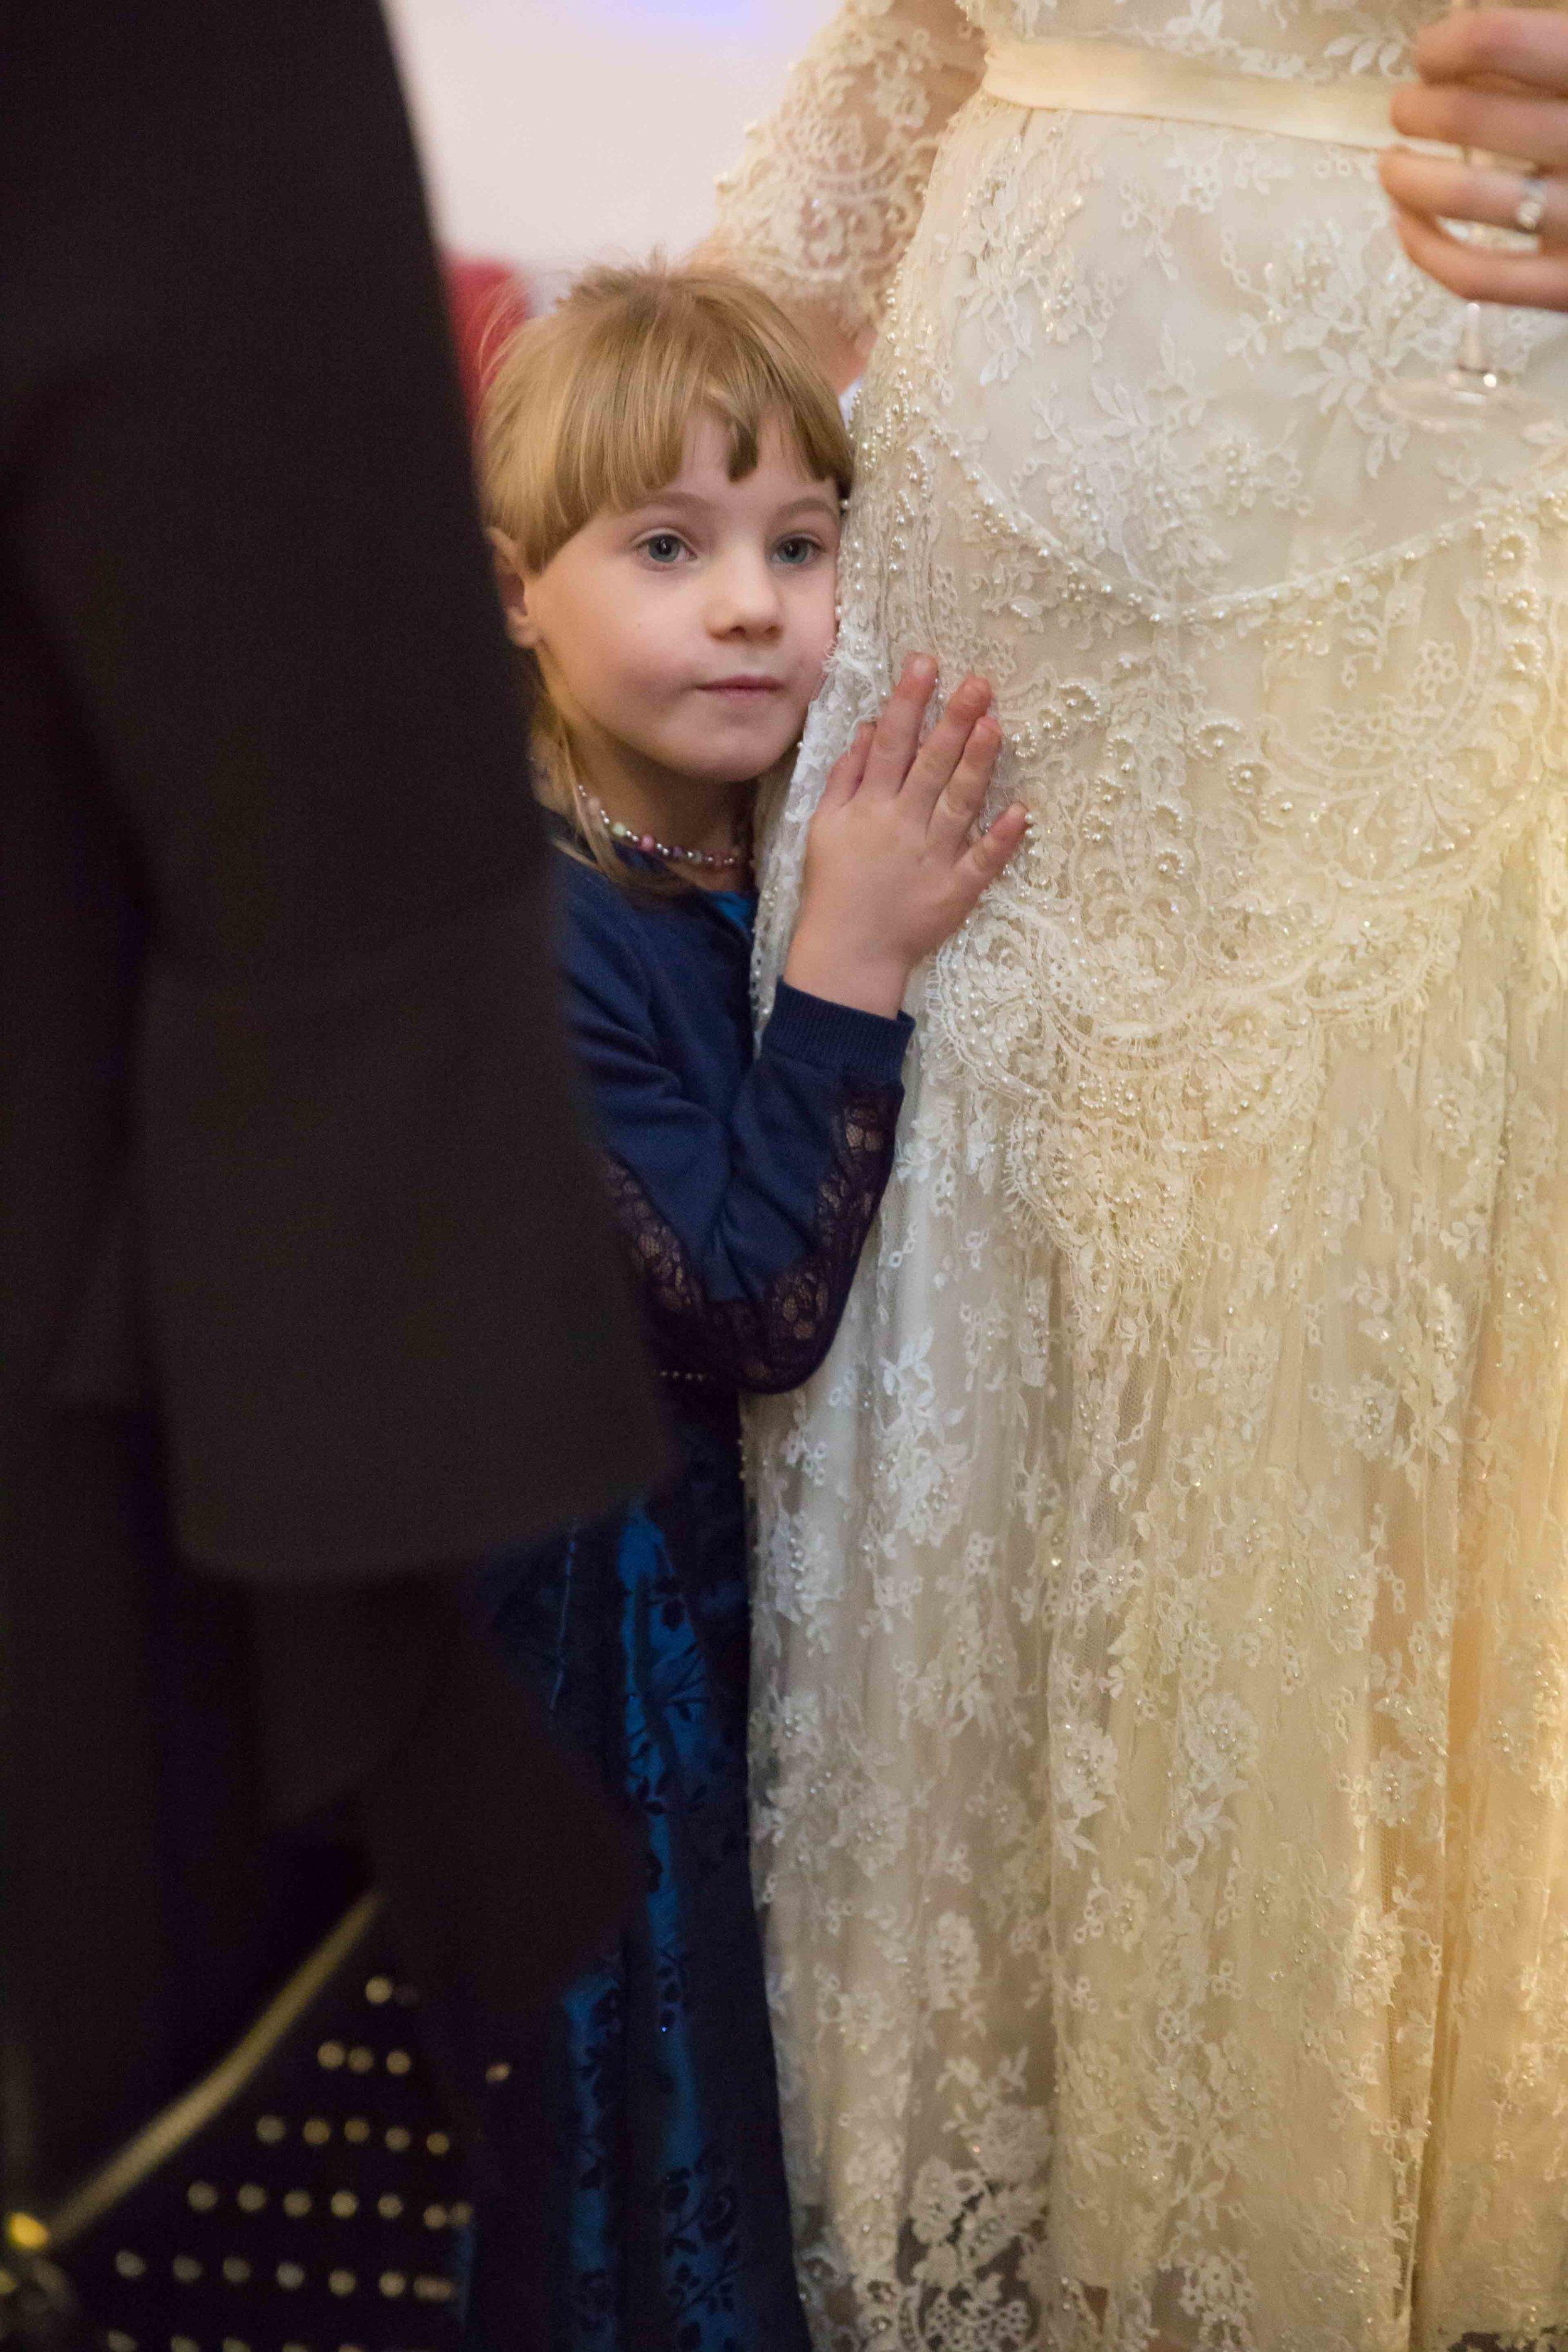 Adam & Faye - Wright Wedding Photography - Bristol Wedding Photographer -168.jpg